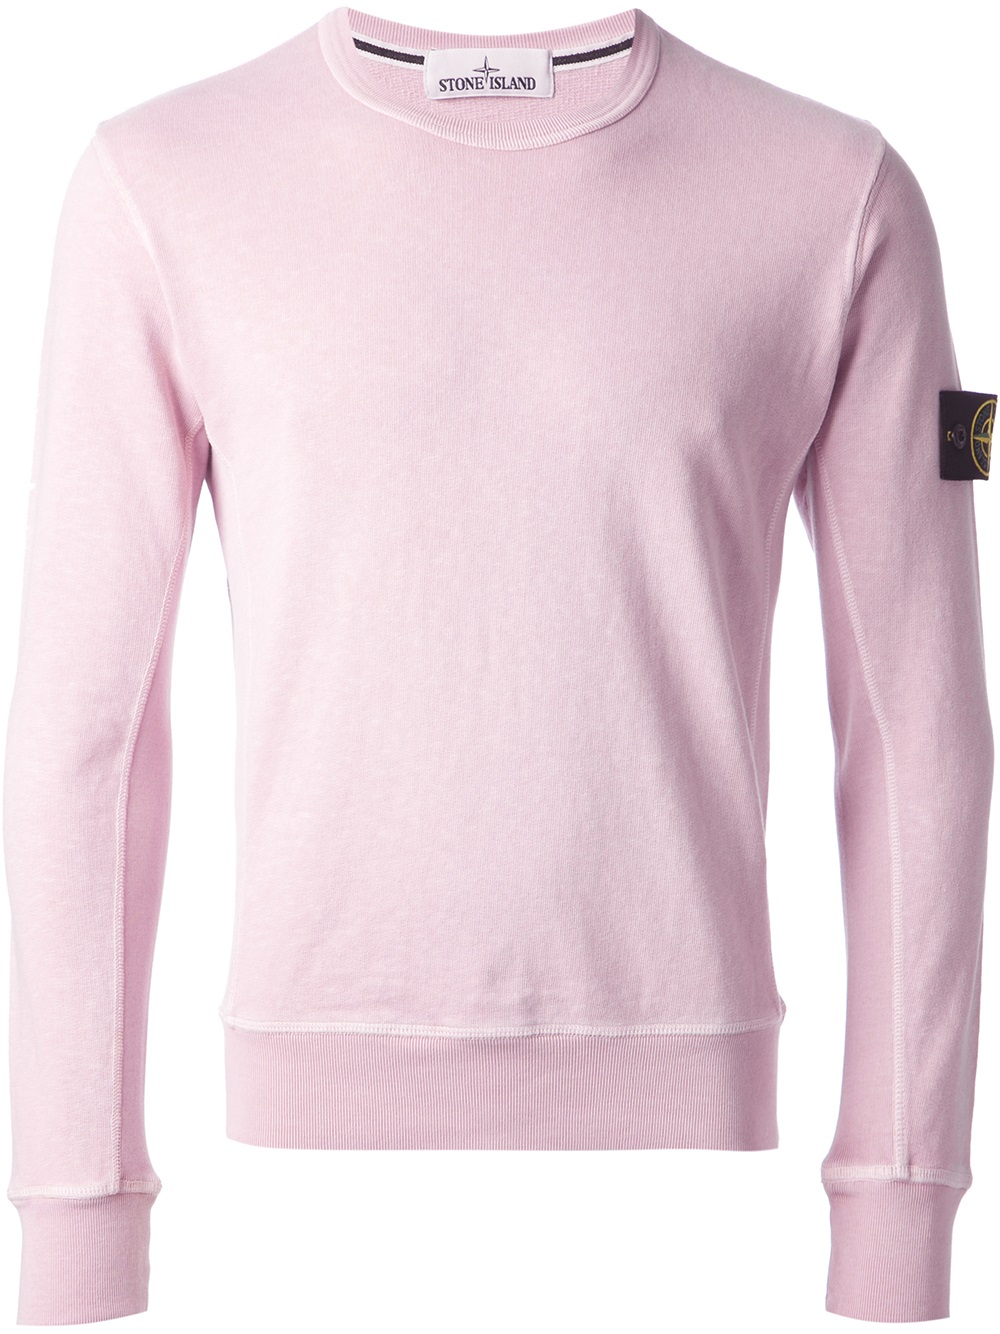 e05c03878f11 Stone Island Logo Patch Sweatshirt in Pink for Men - Lyst